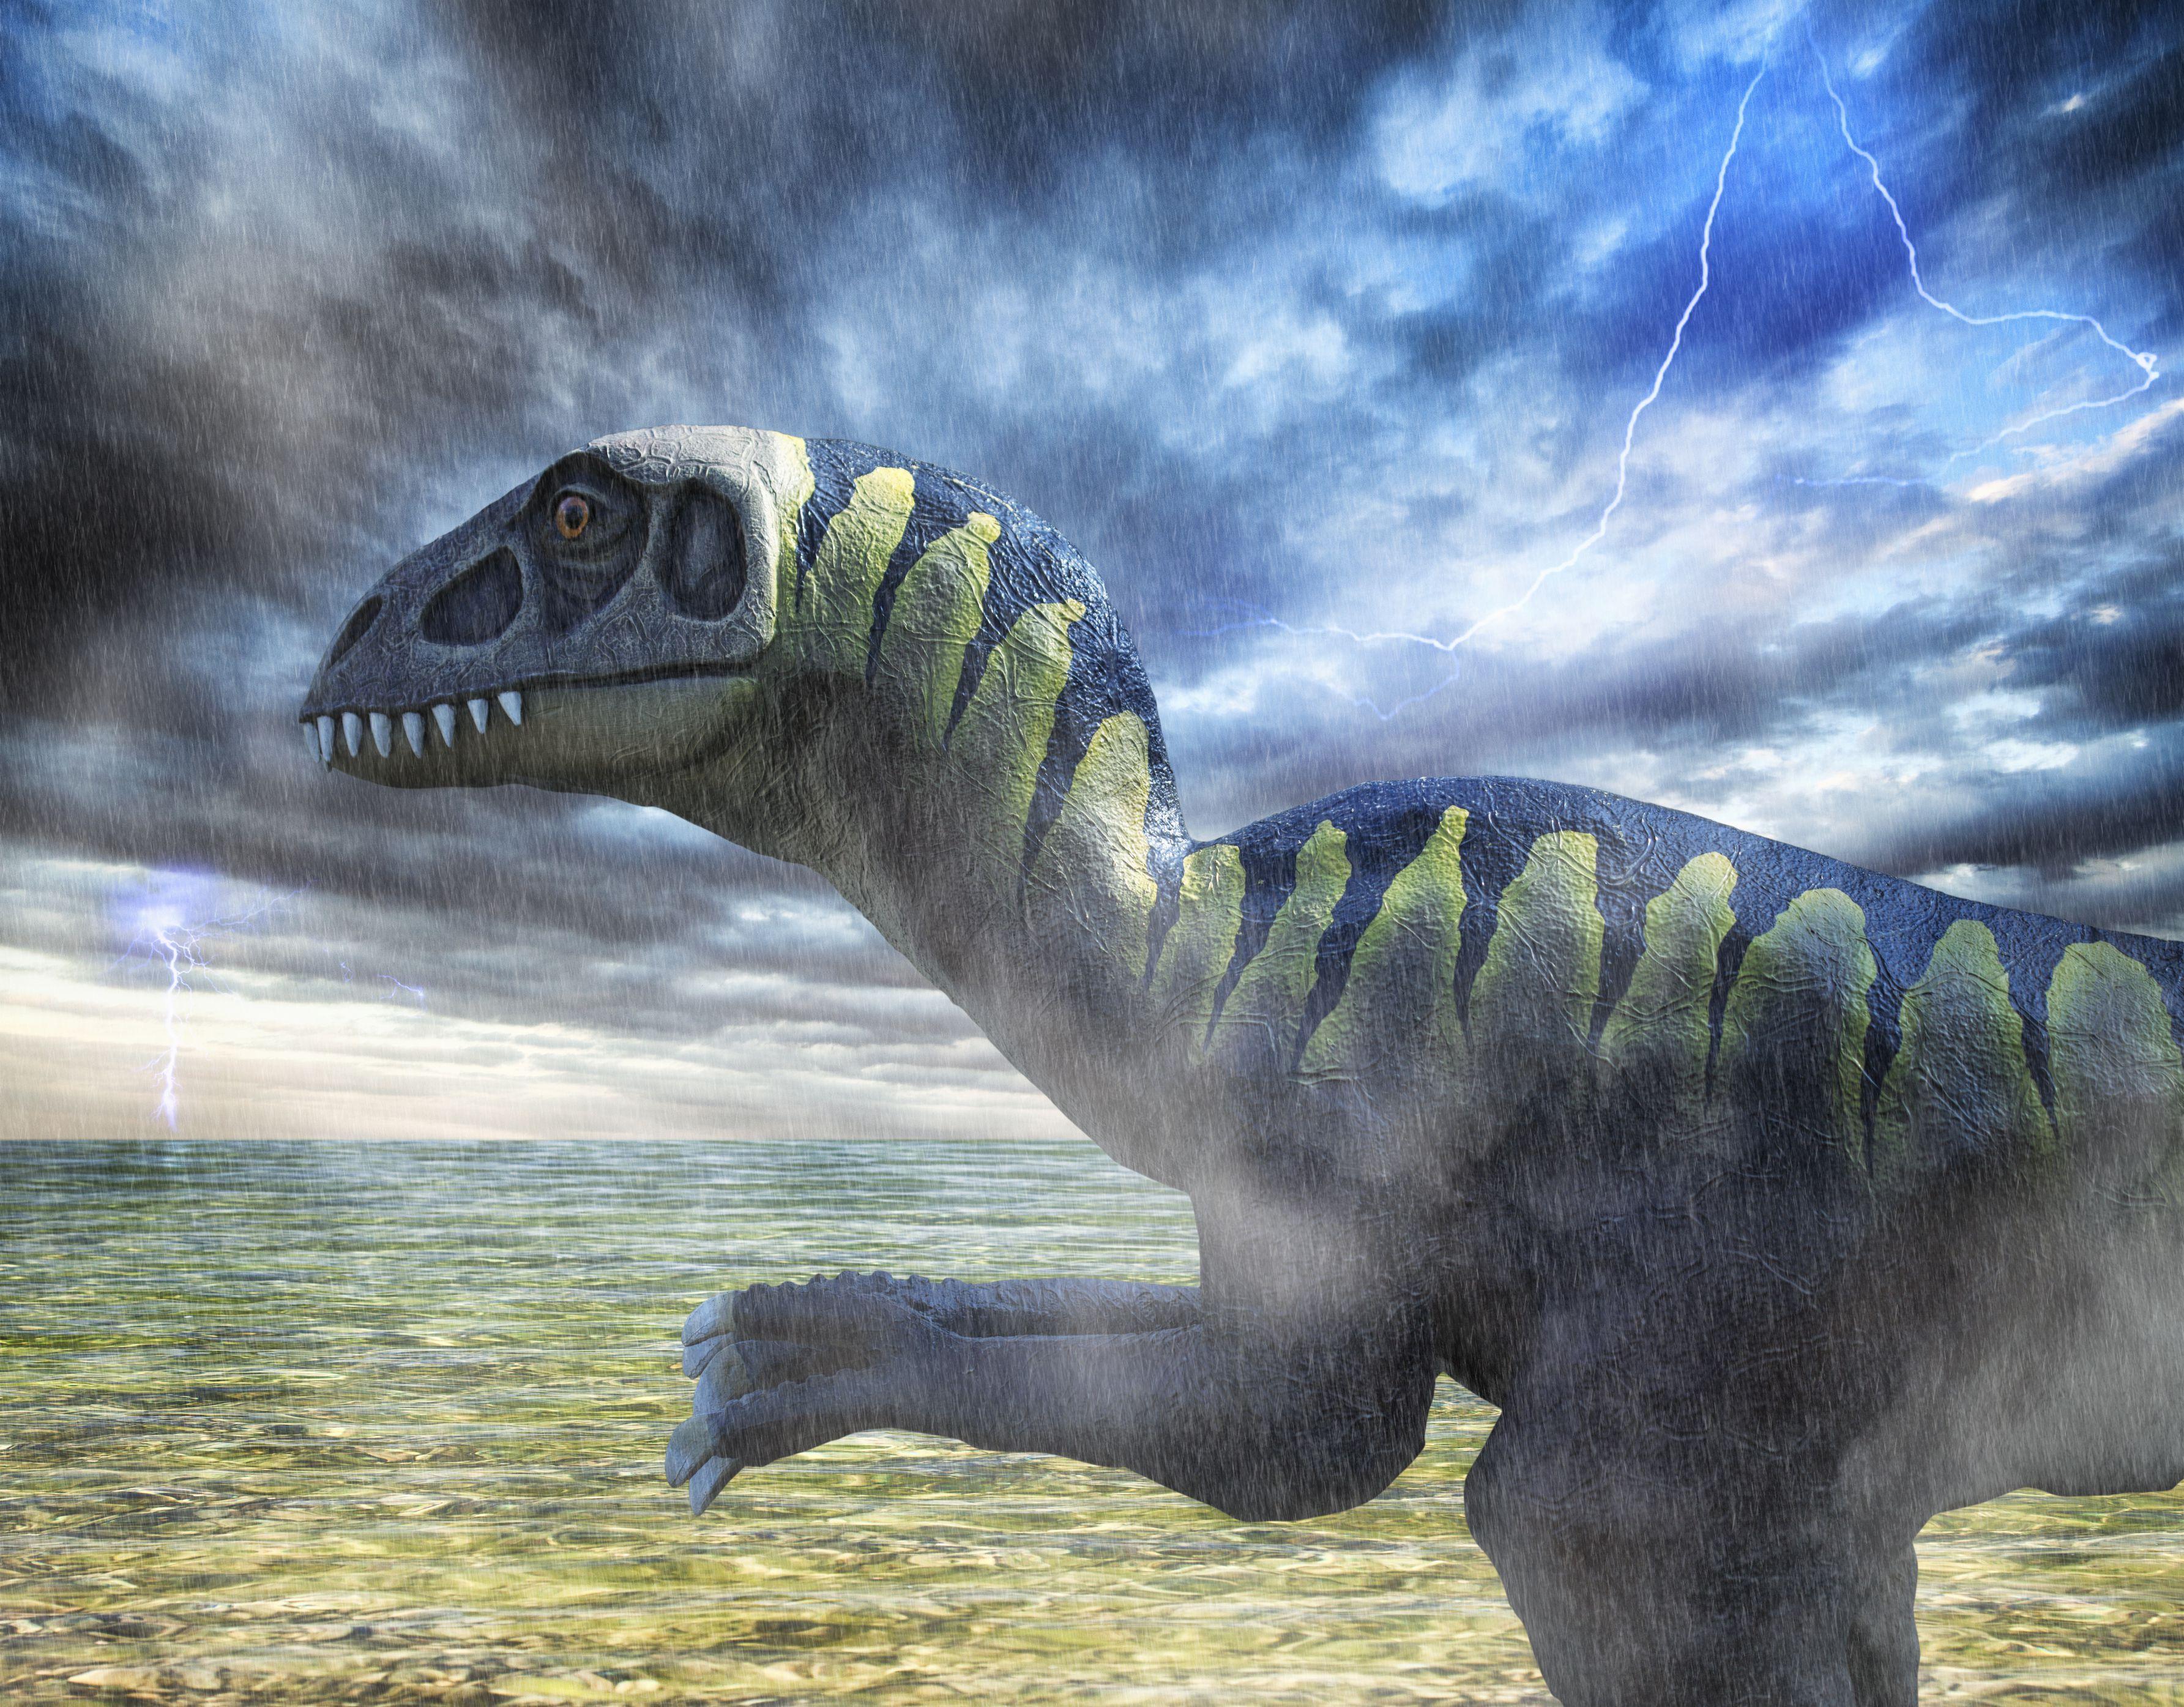 Figure of Troodon